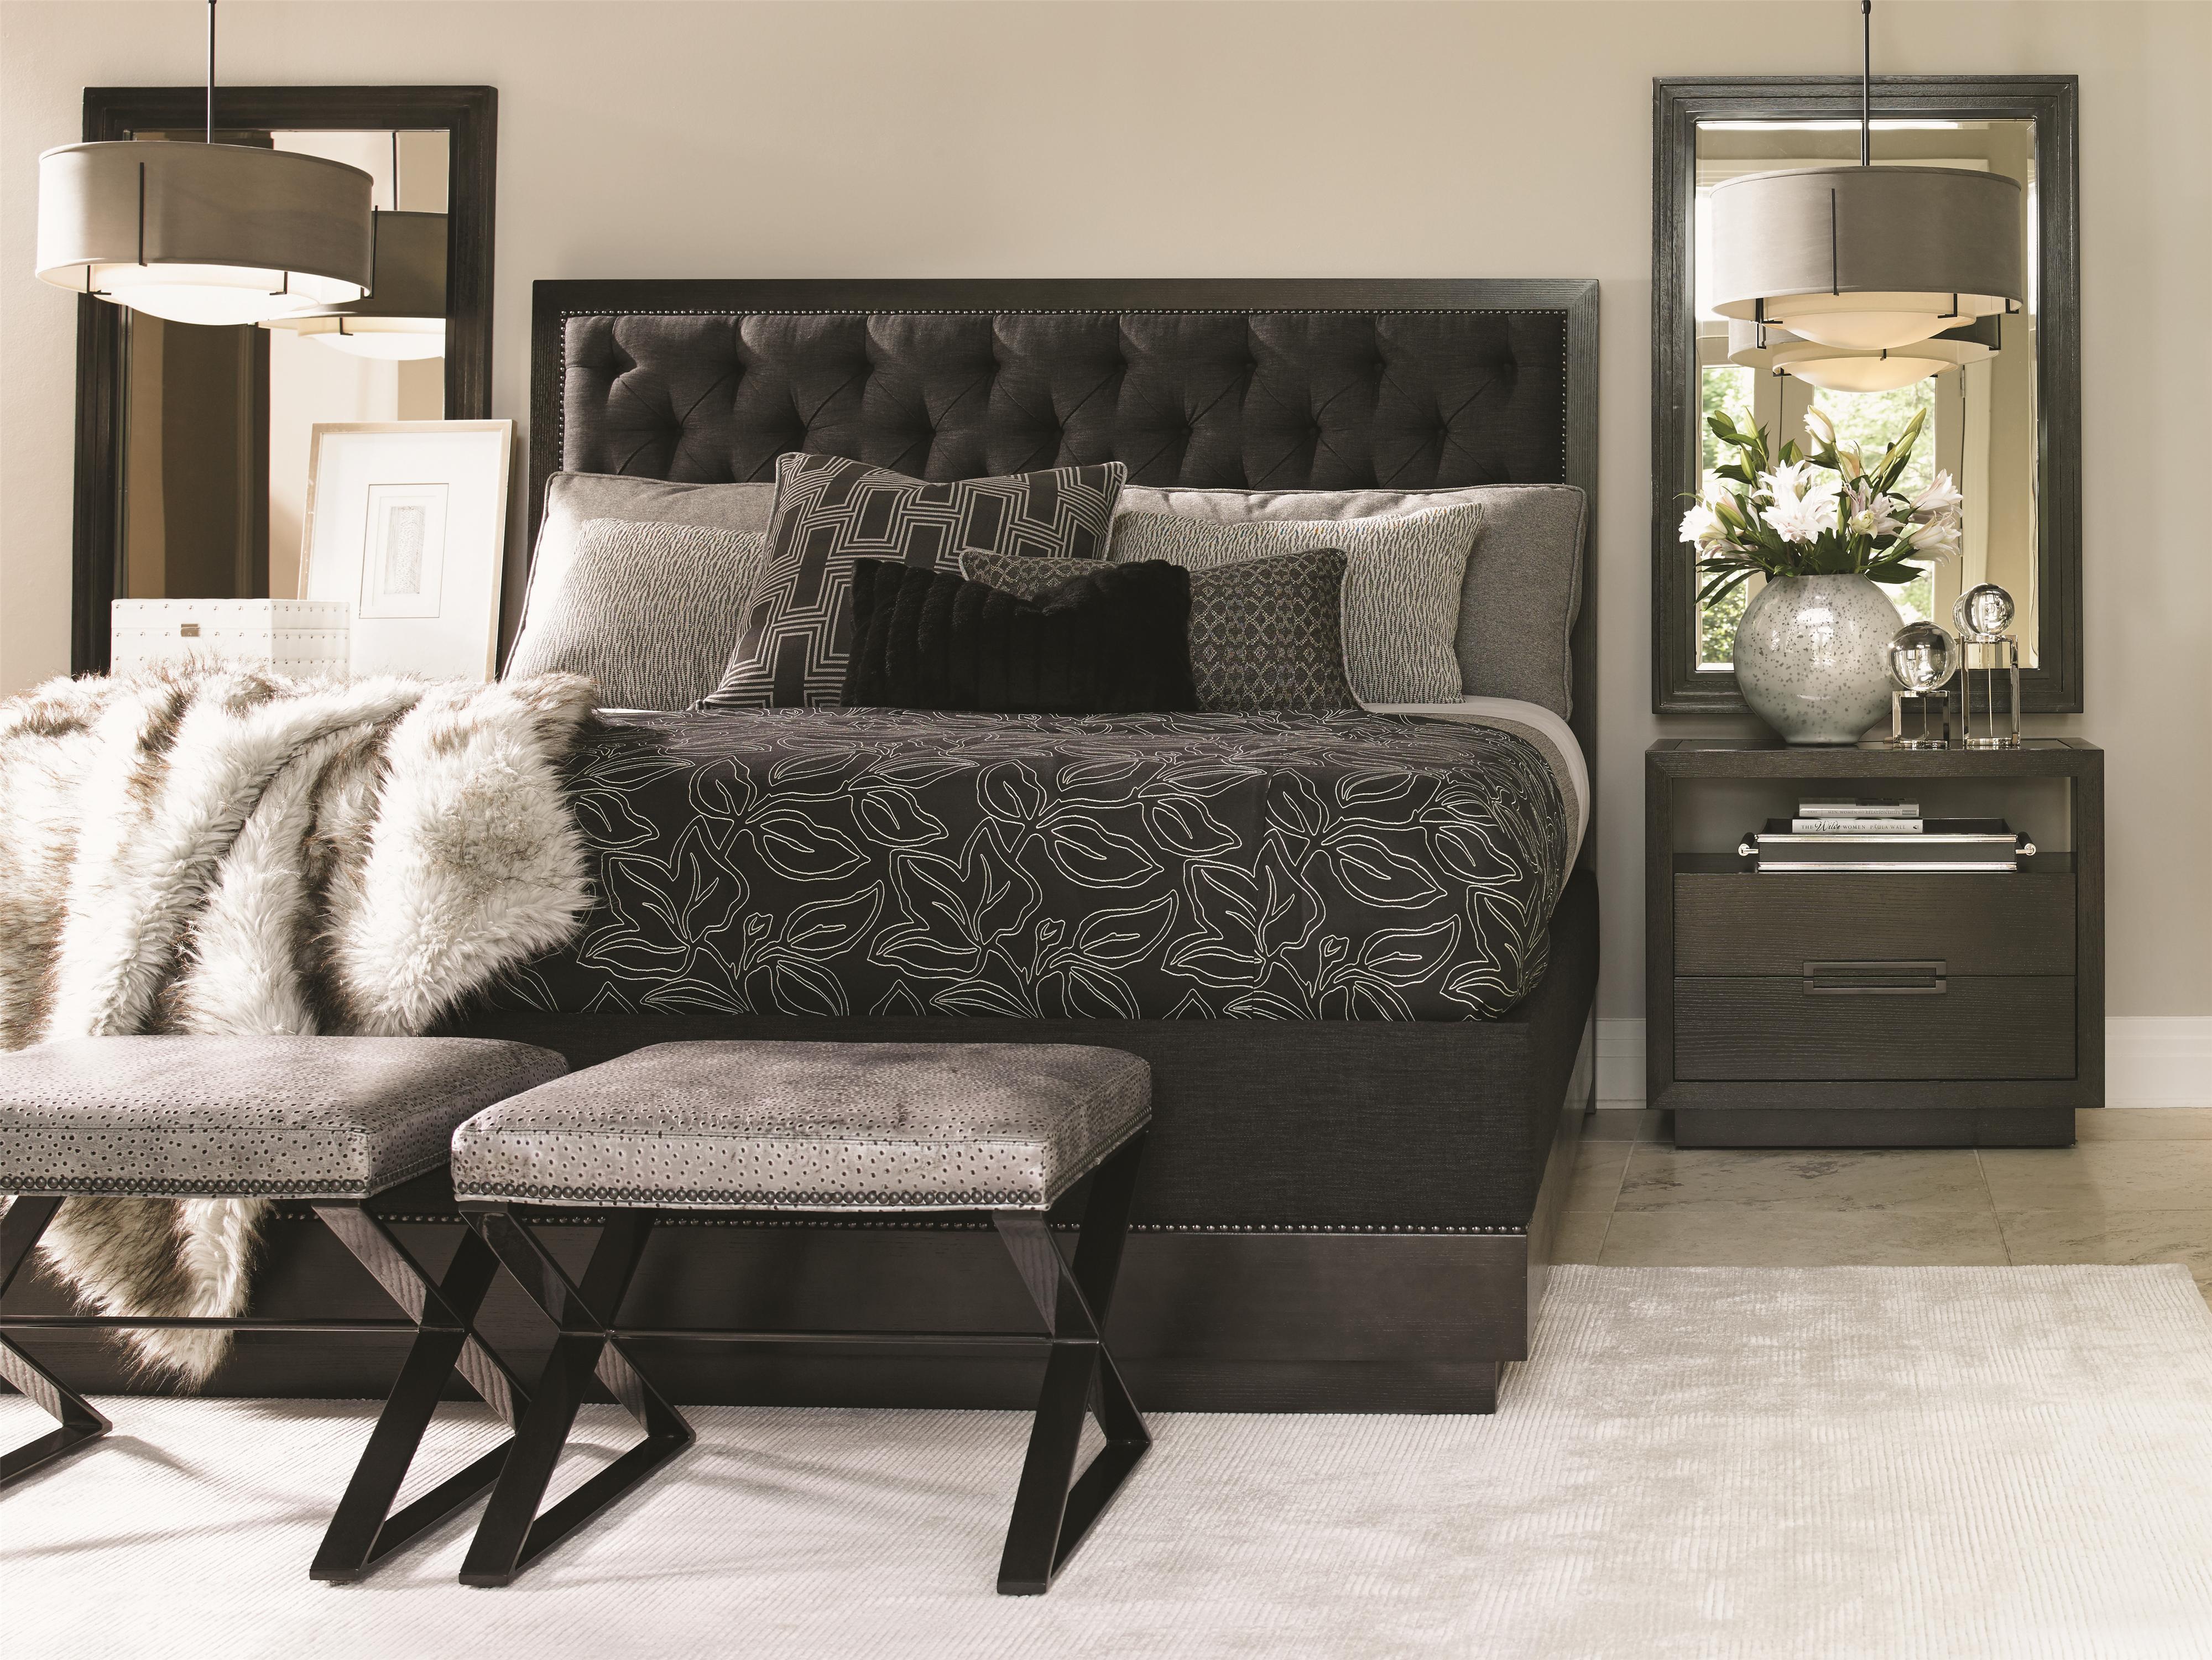 lexington coastal bedroom furniture trend home design fieldale lodge pine lakes bedroom set lexington bedoom